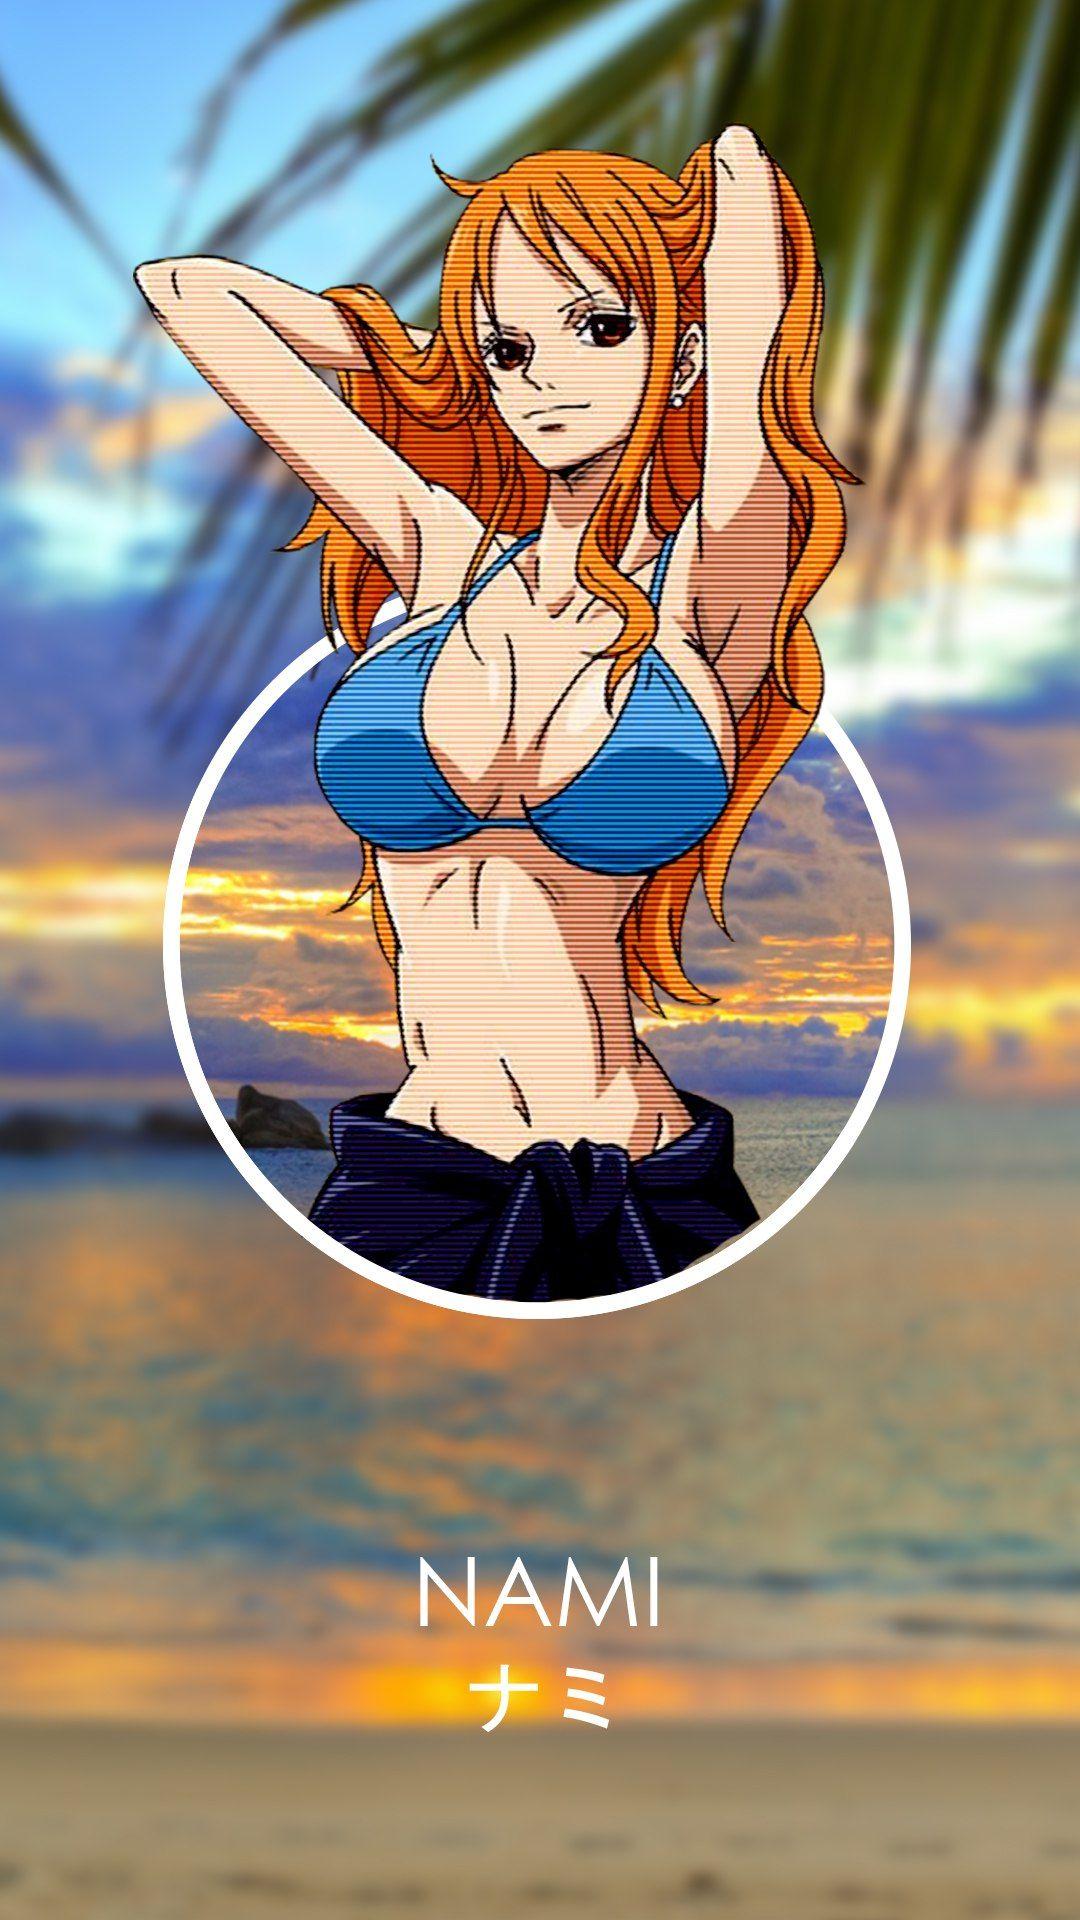 Nami Wallpaper Arte De Anime Nami One Piece Y Figuras De